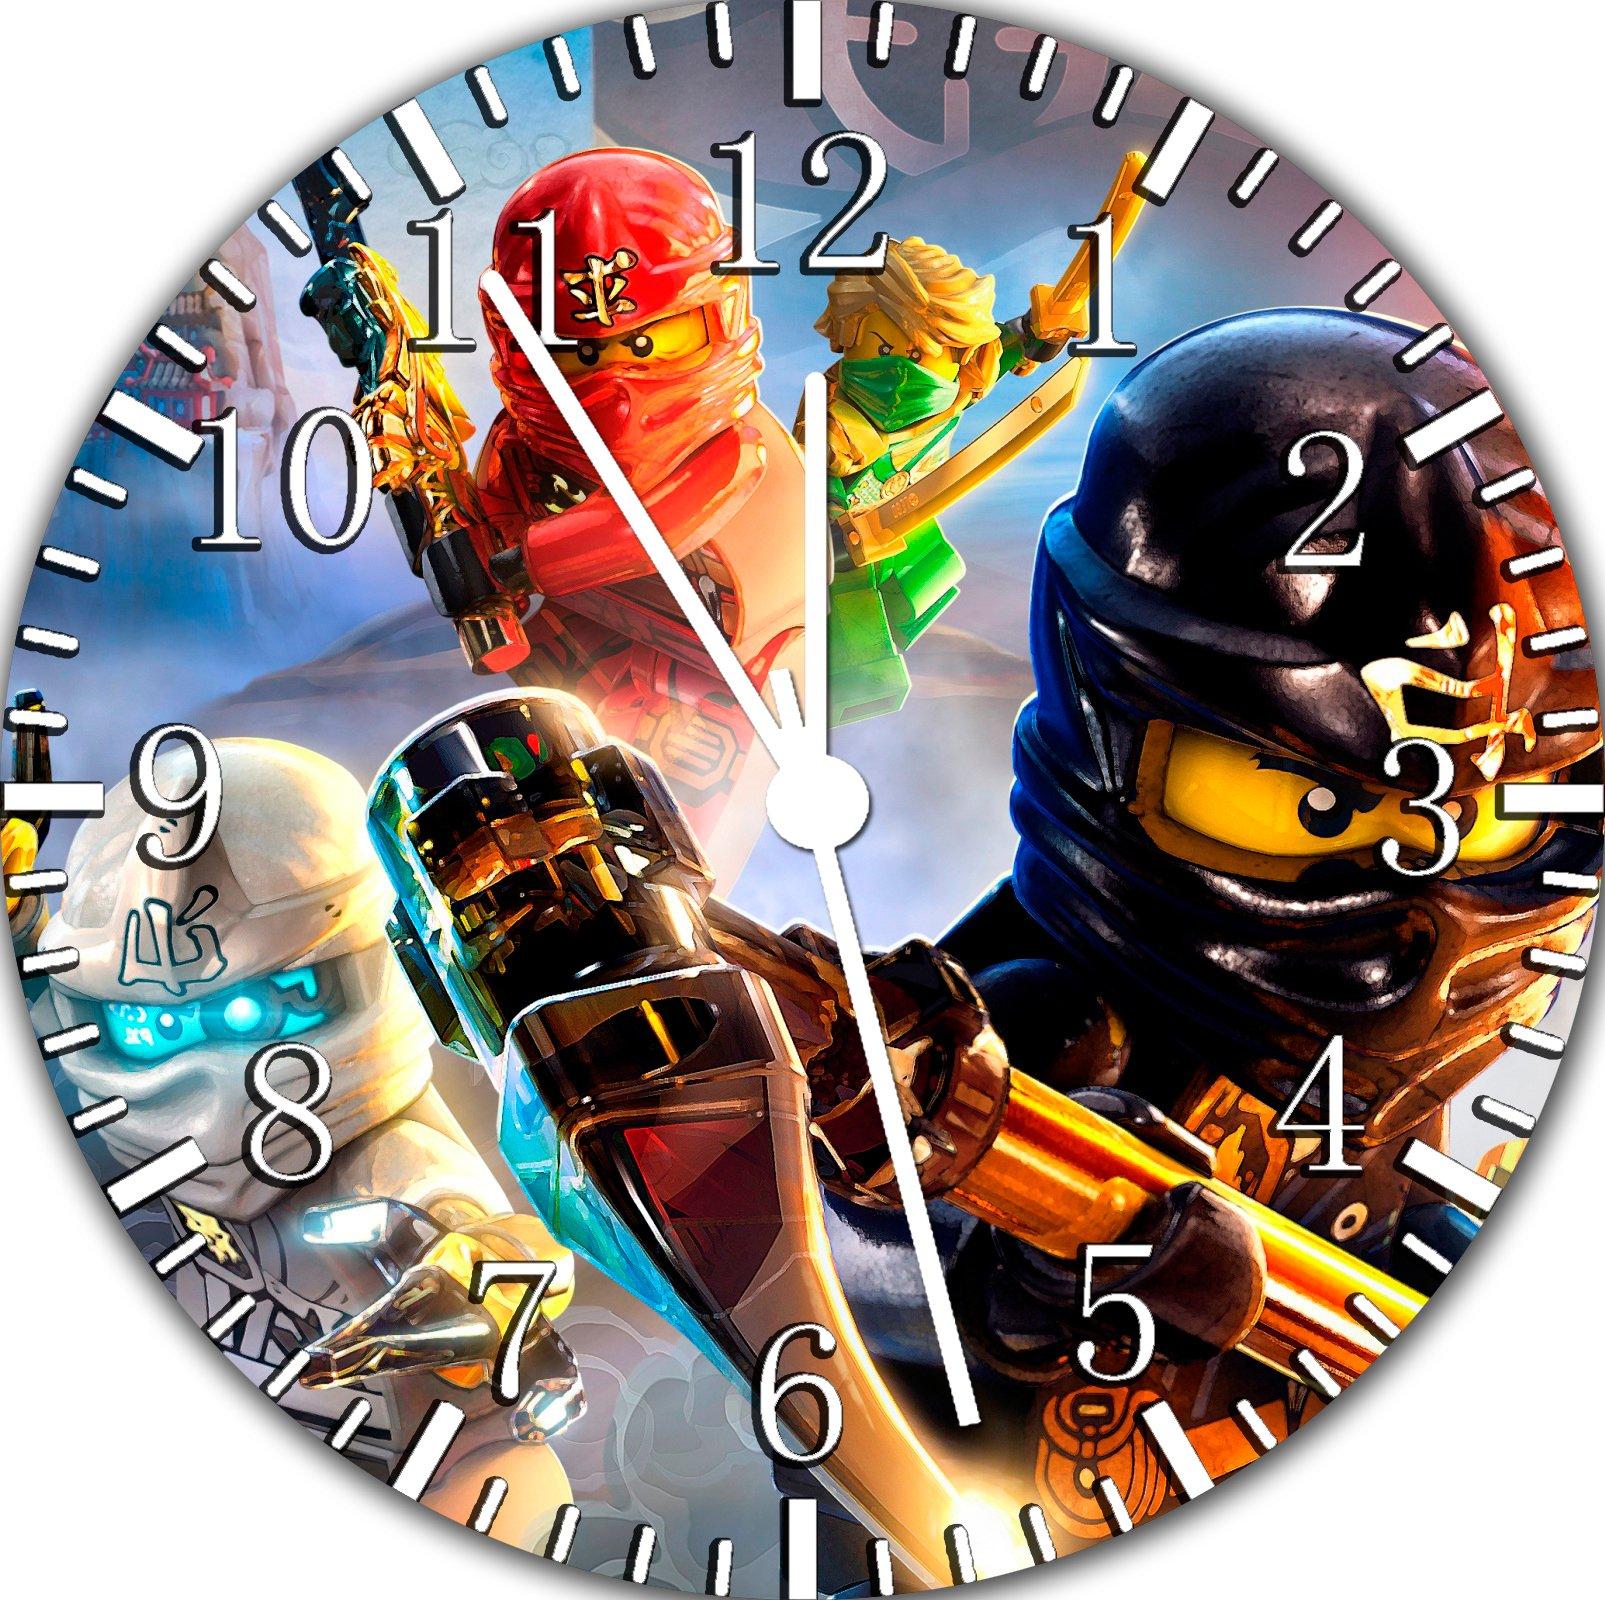 Lego Ninja Ninjago Frameless Borderless Wall Clock F82 Nice For Gift or Room Wall Decor